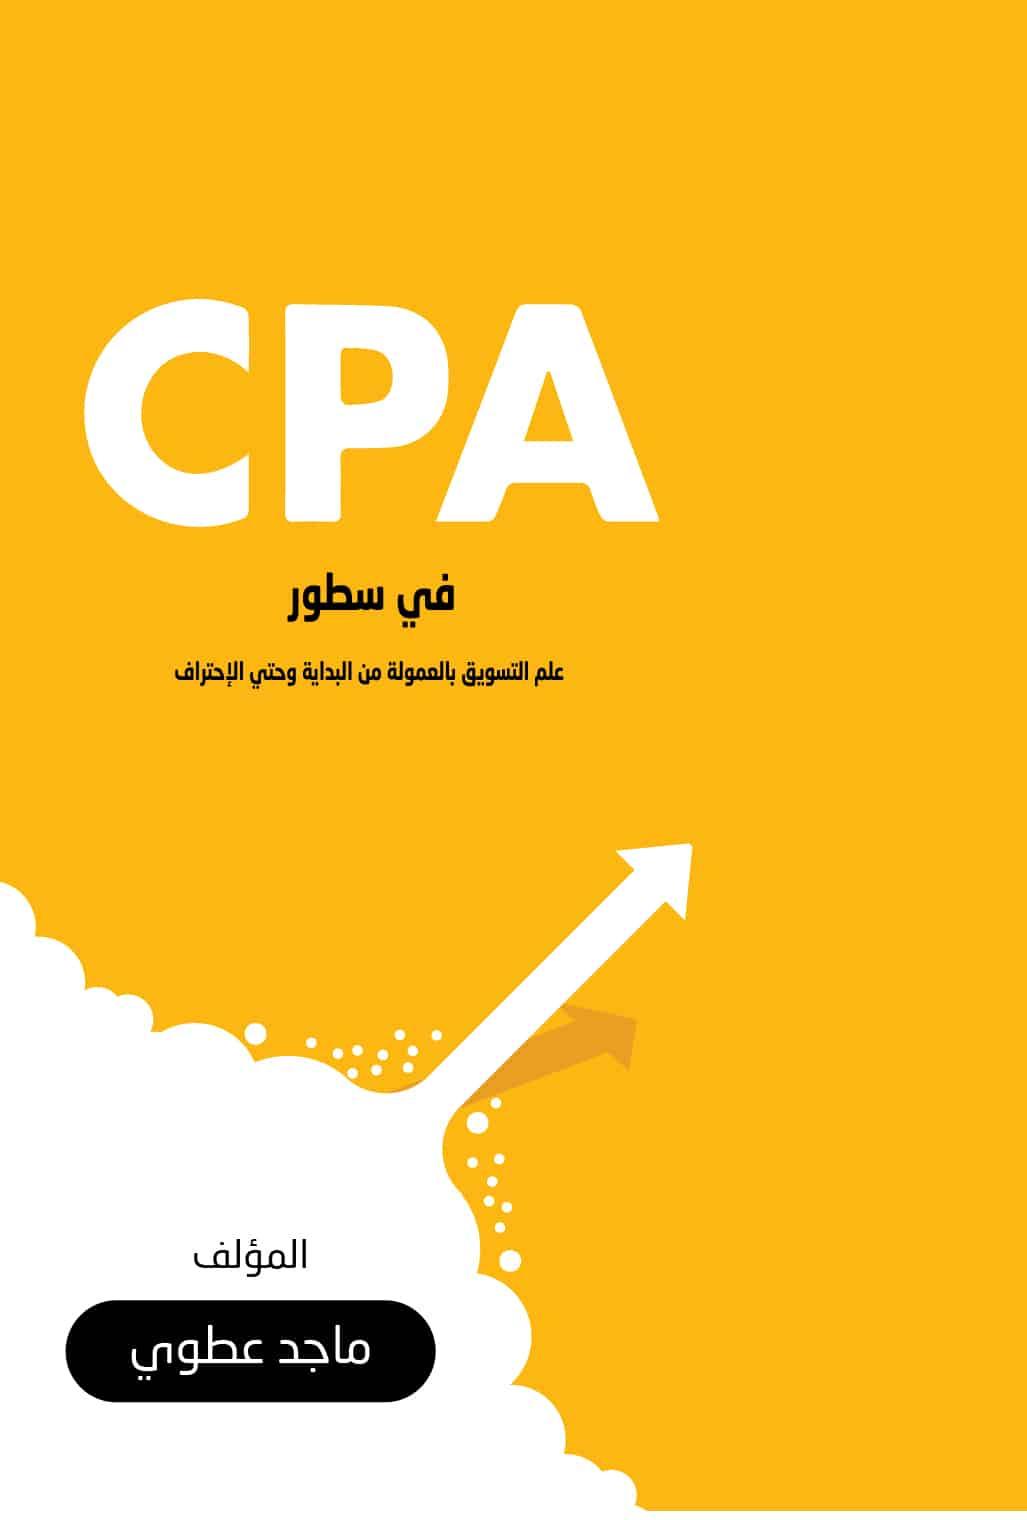 CPA مراجعة كتاب CPA في سطور: احتراف التسويق بالعمولة وإليك سر لاستغلاله